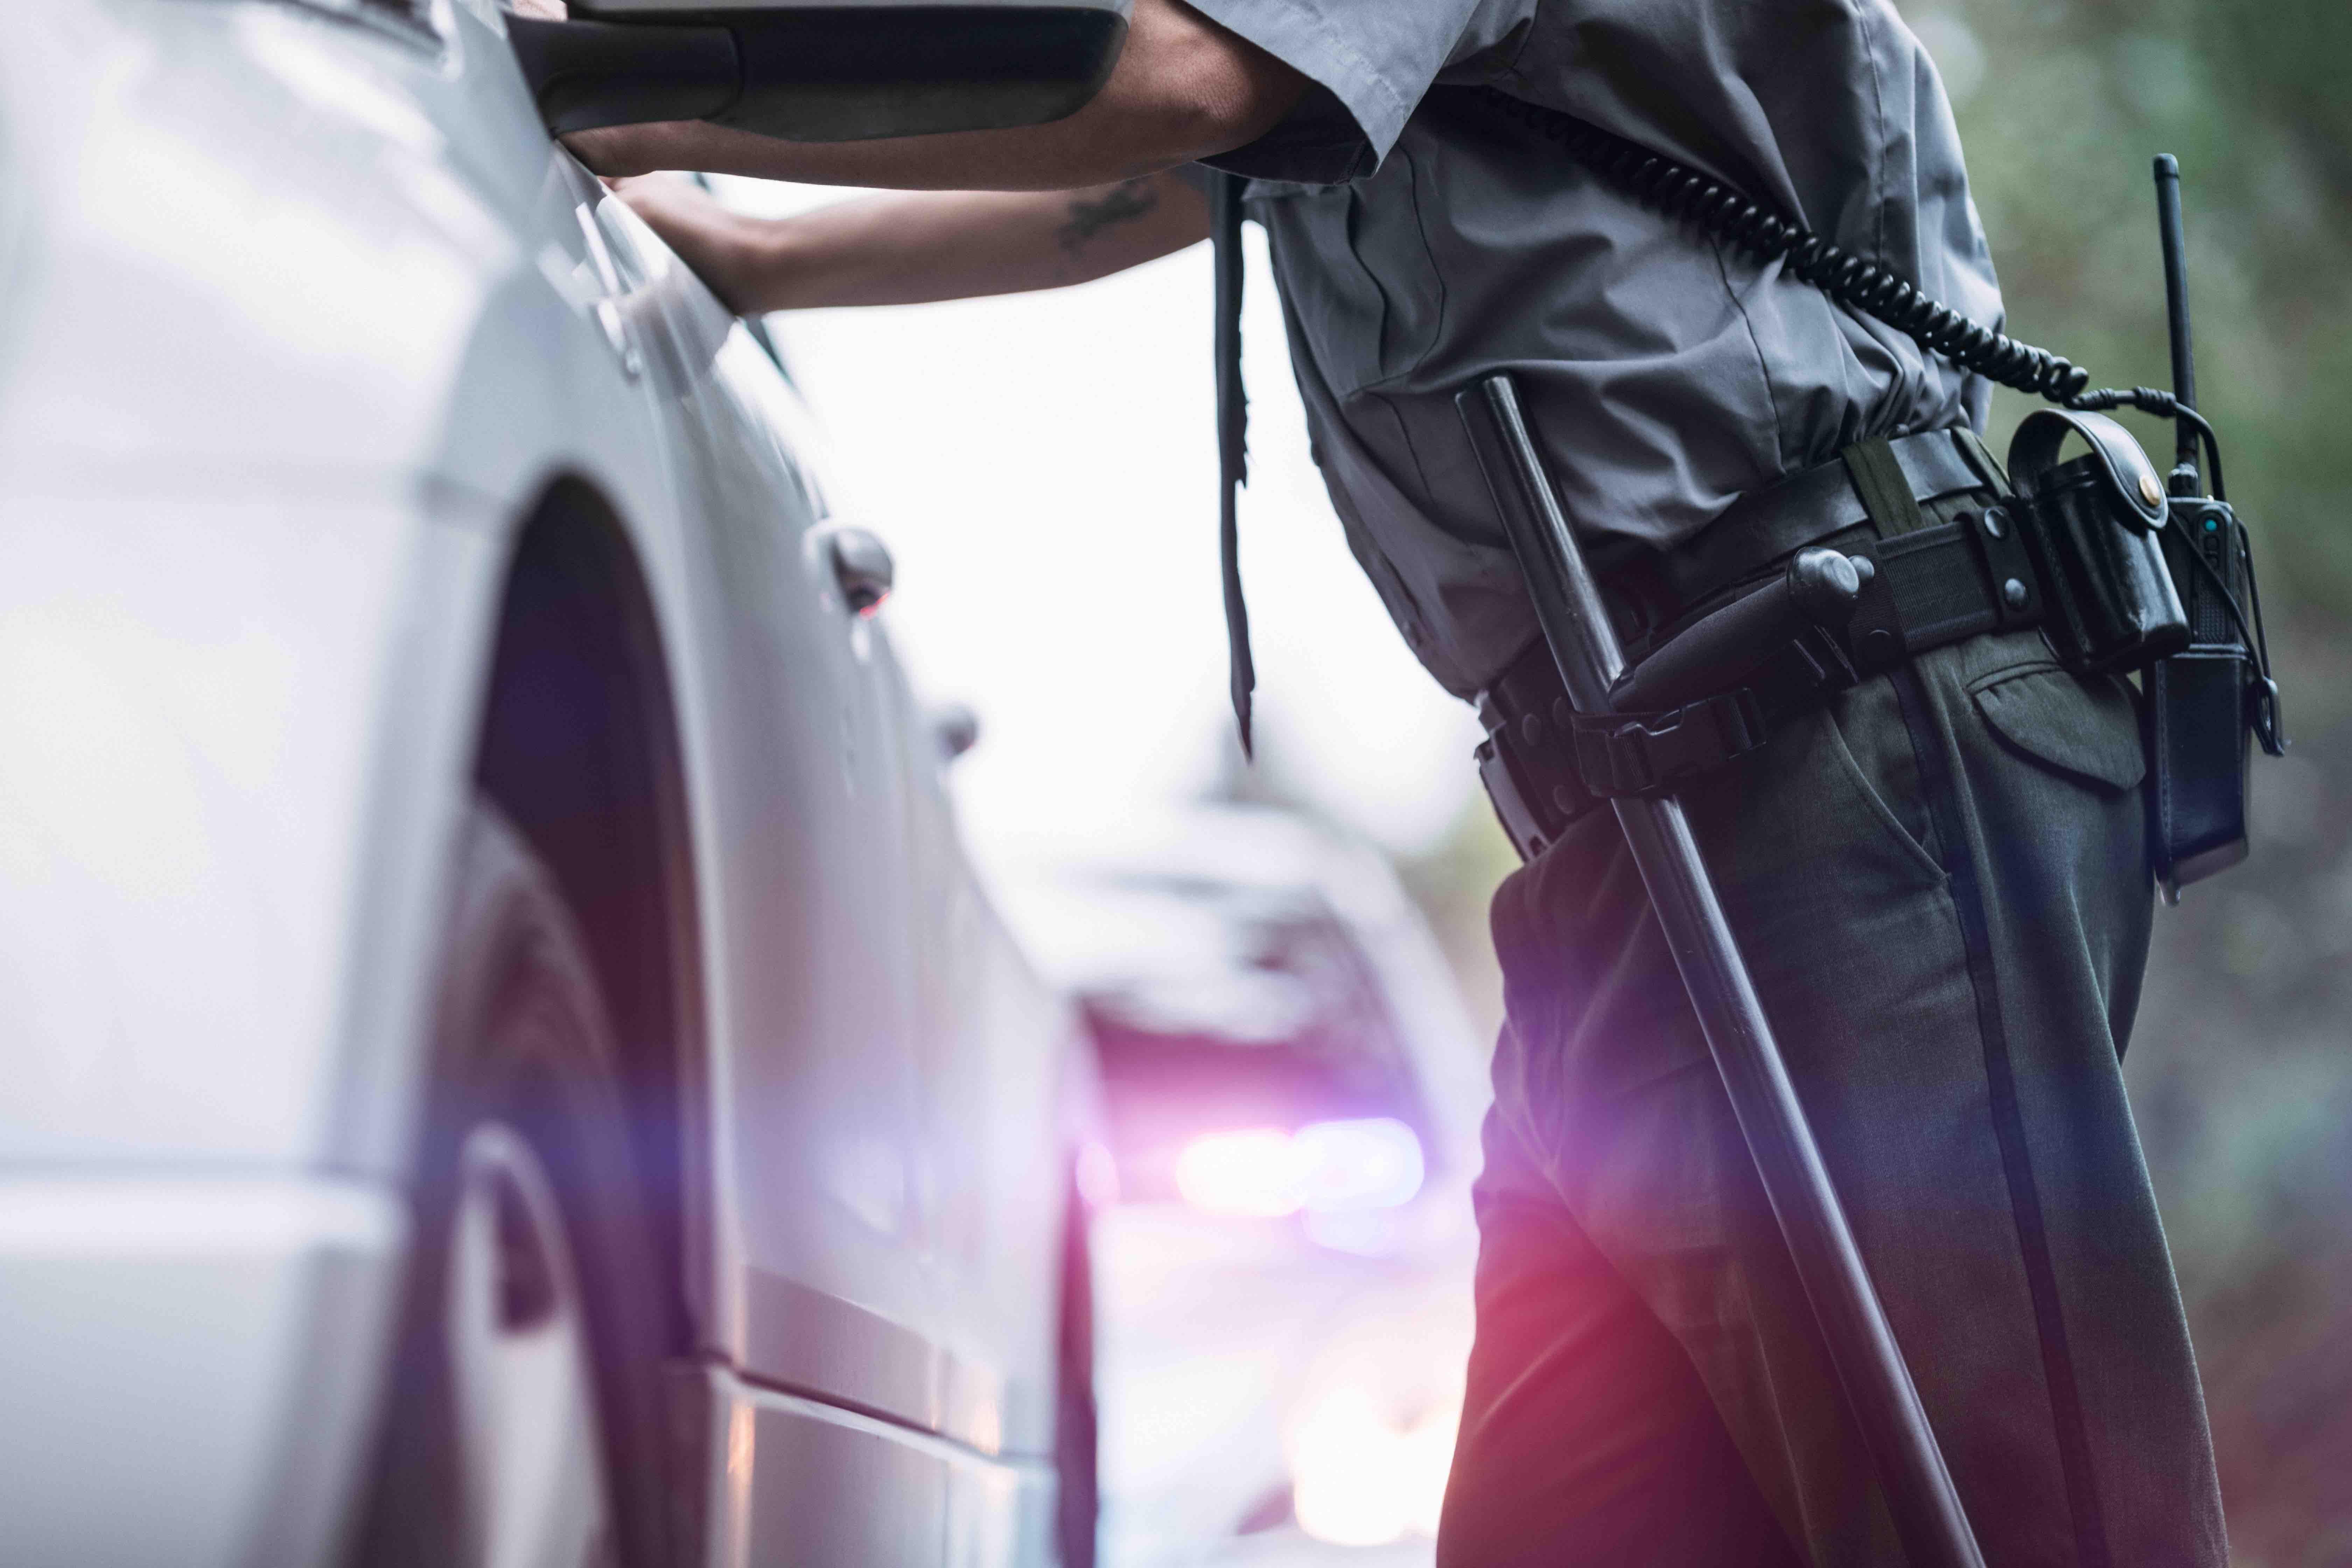 Dominican Police Open Investigation Into Shooting at Prominent Urbano Radio Show Alofoke